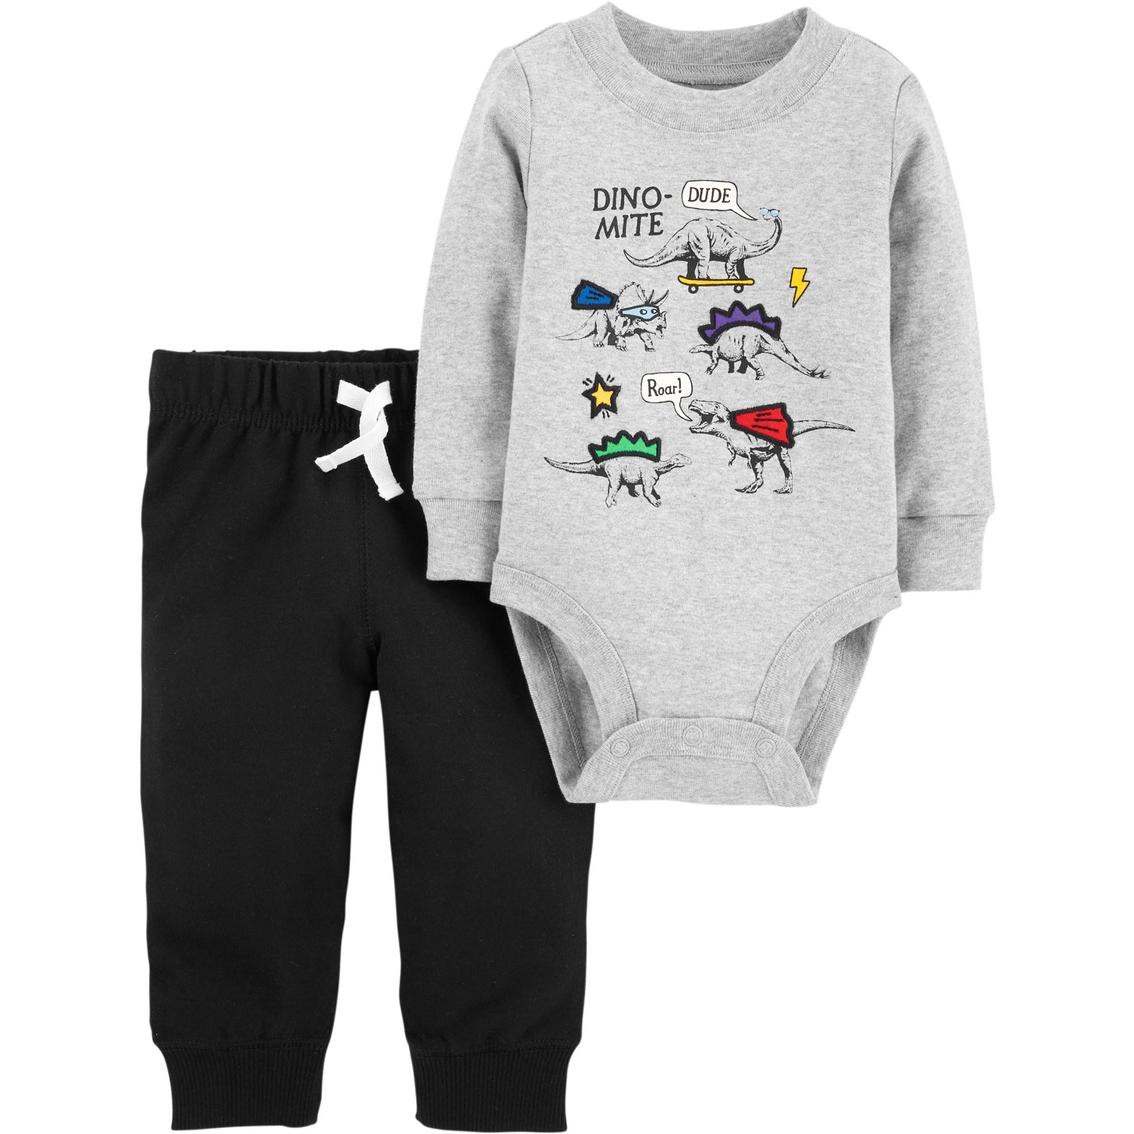 b6ea400bf Carter's Infant Boys Dino Mite 2 Pc Bodysuit Pant Set | Baby Boy 0 ...